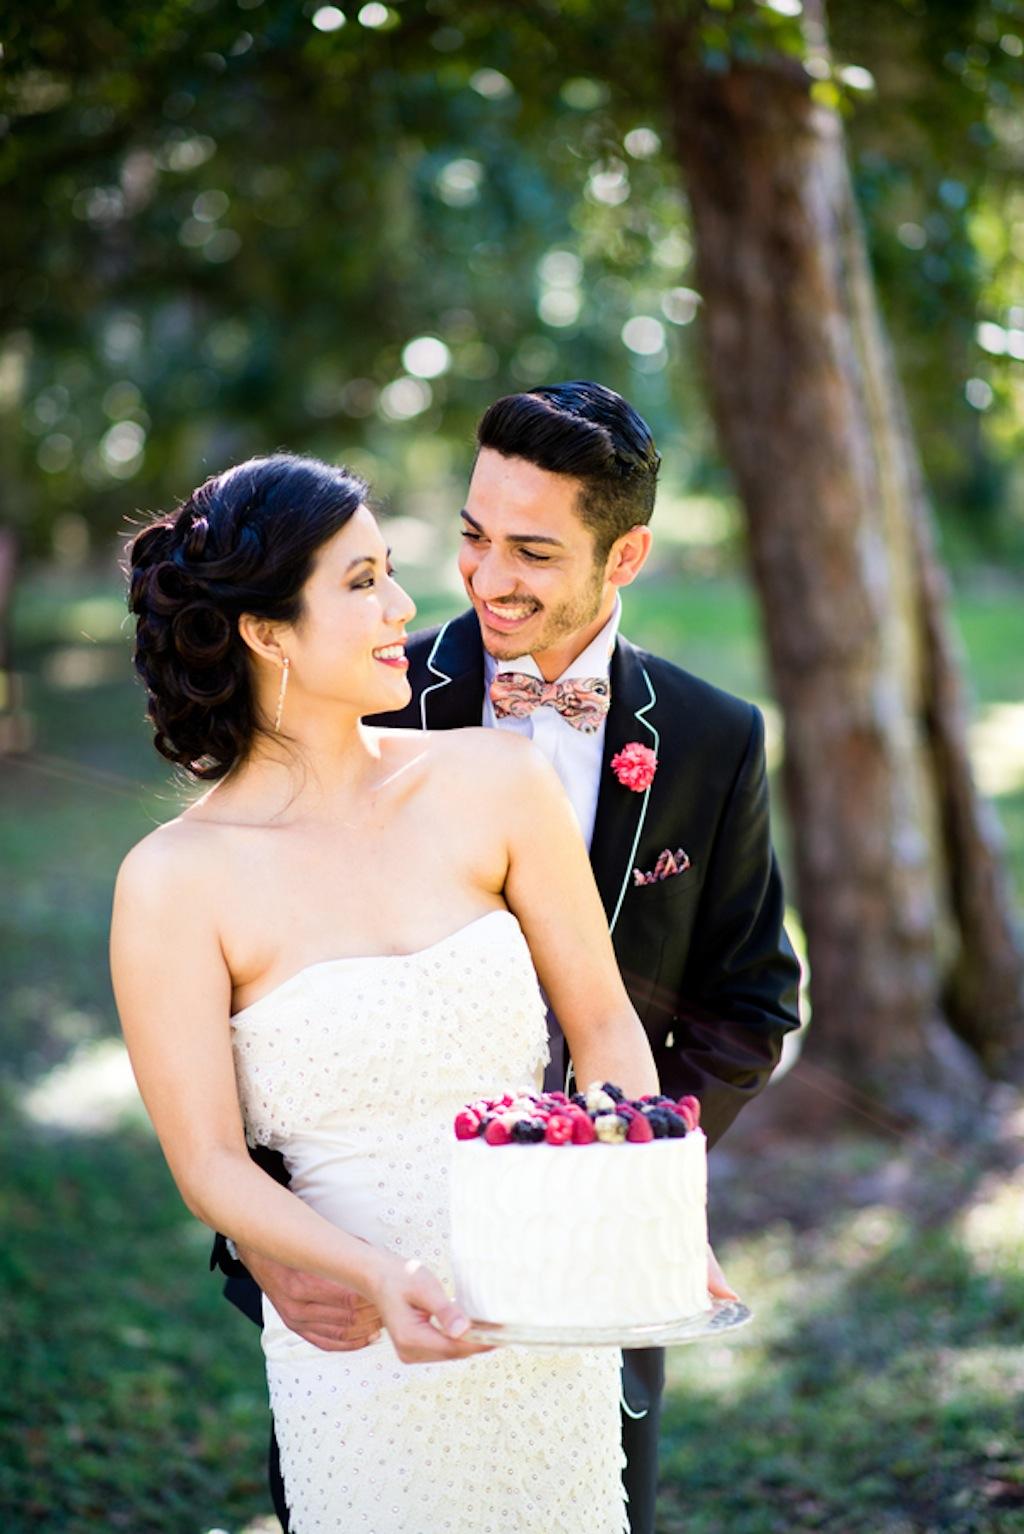 White Berry Wedding Cake   Vintage, Garden Wedding Styled Shoot by Kera Photography